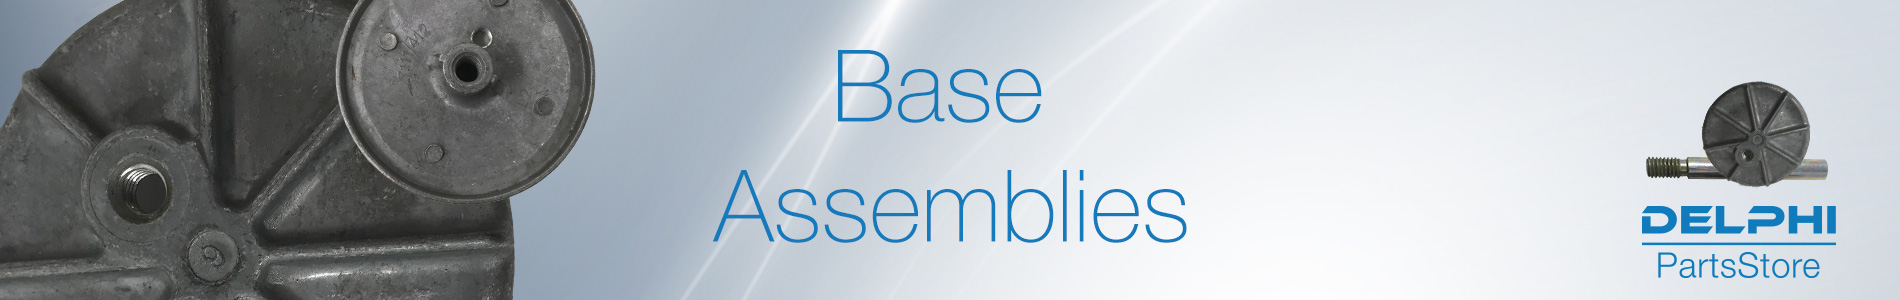 Base Assemblies